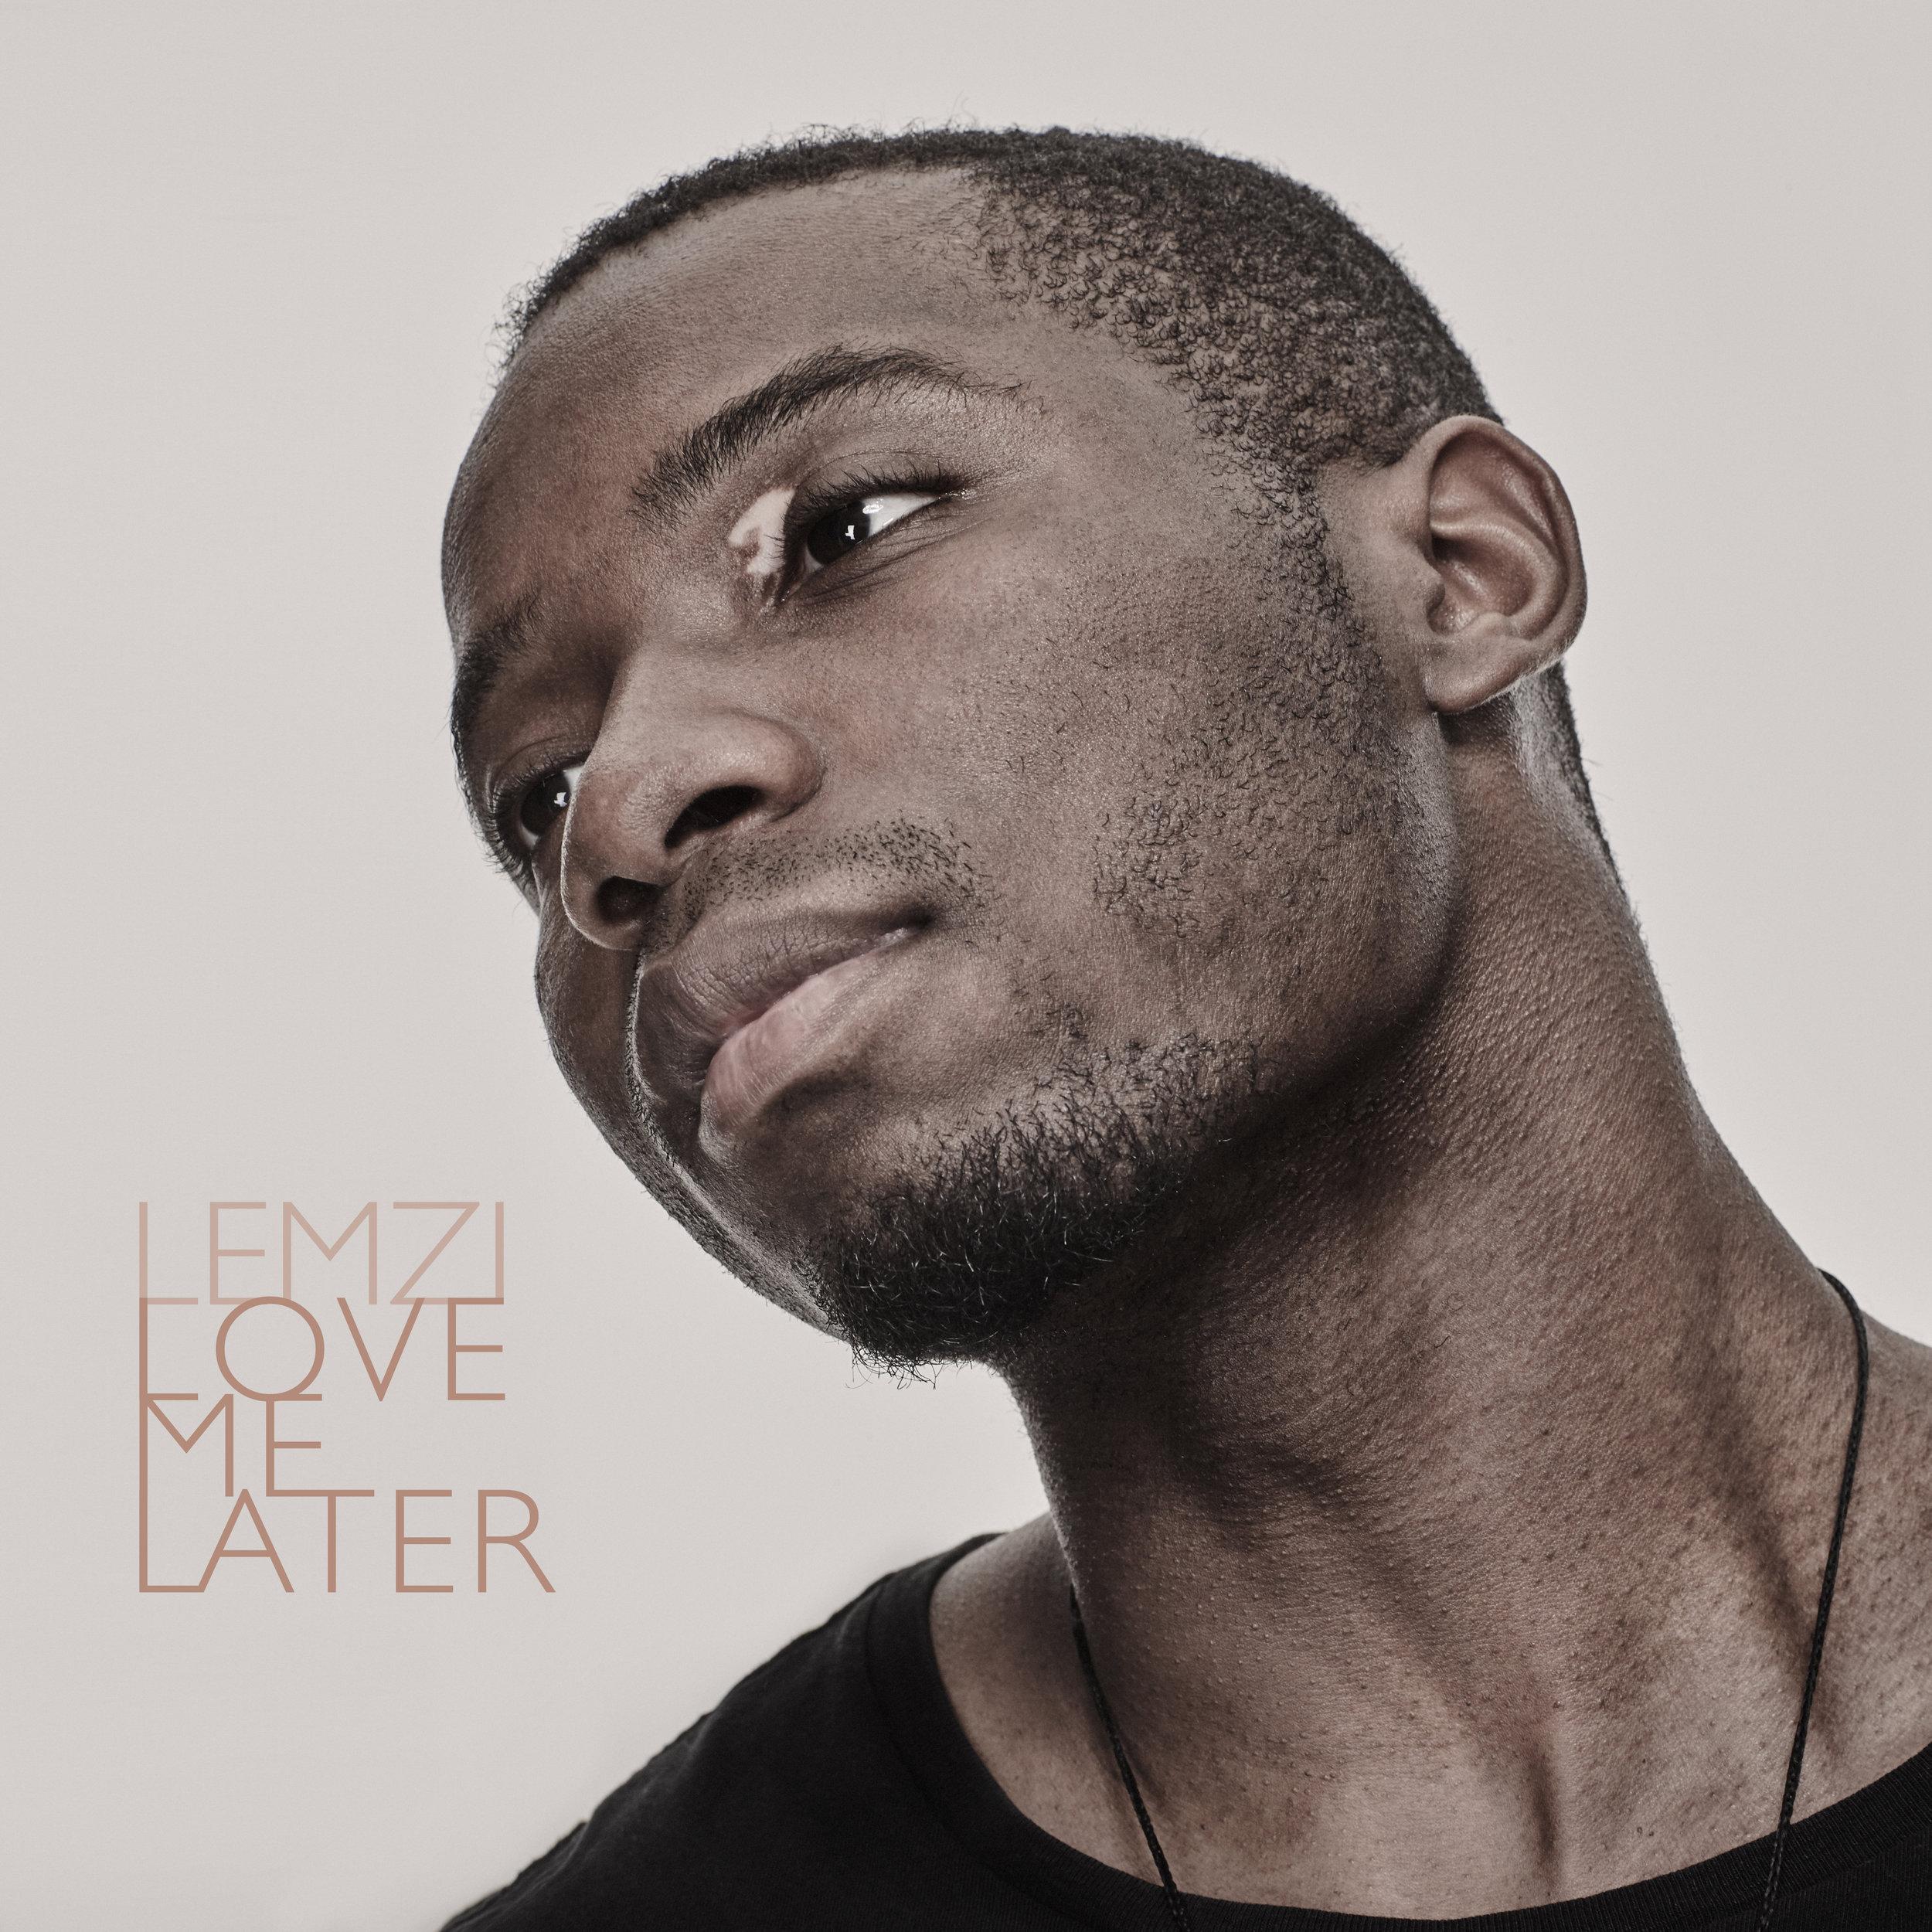 Love Me Later (single)